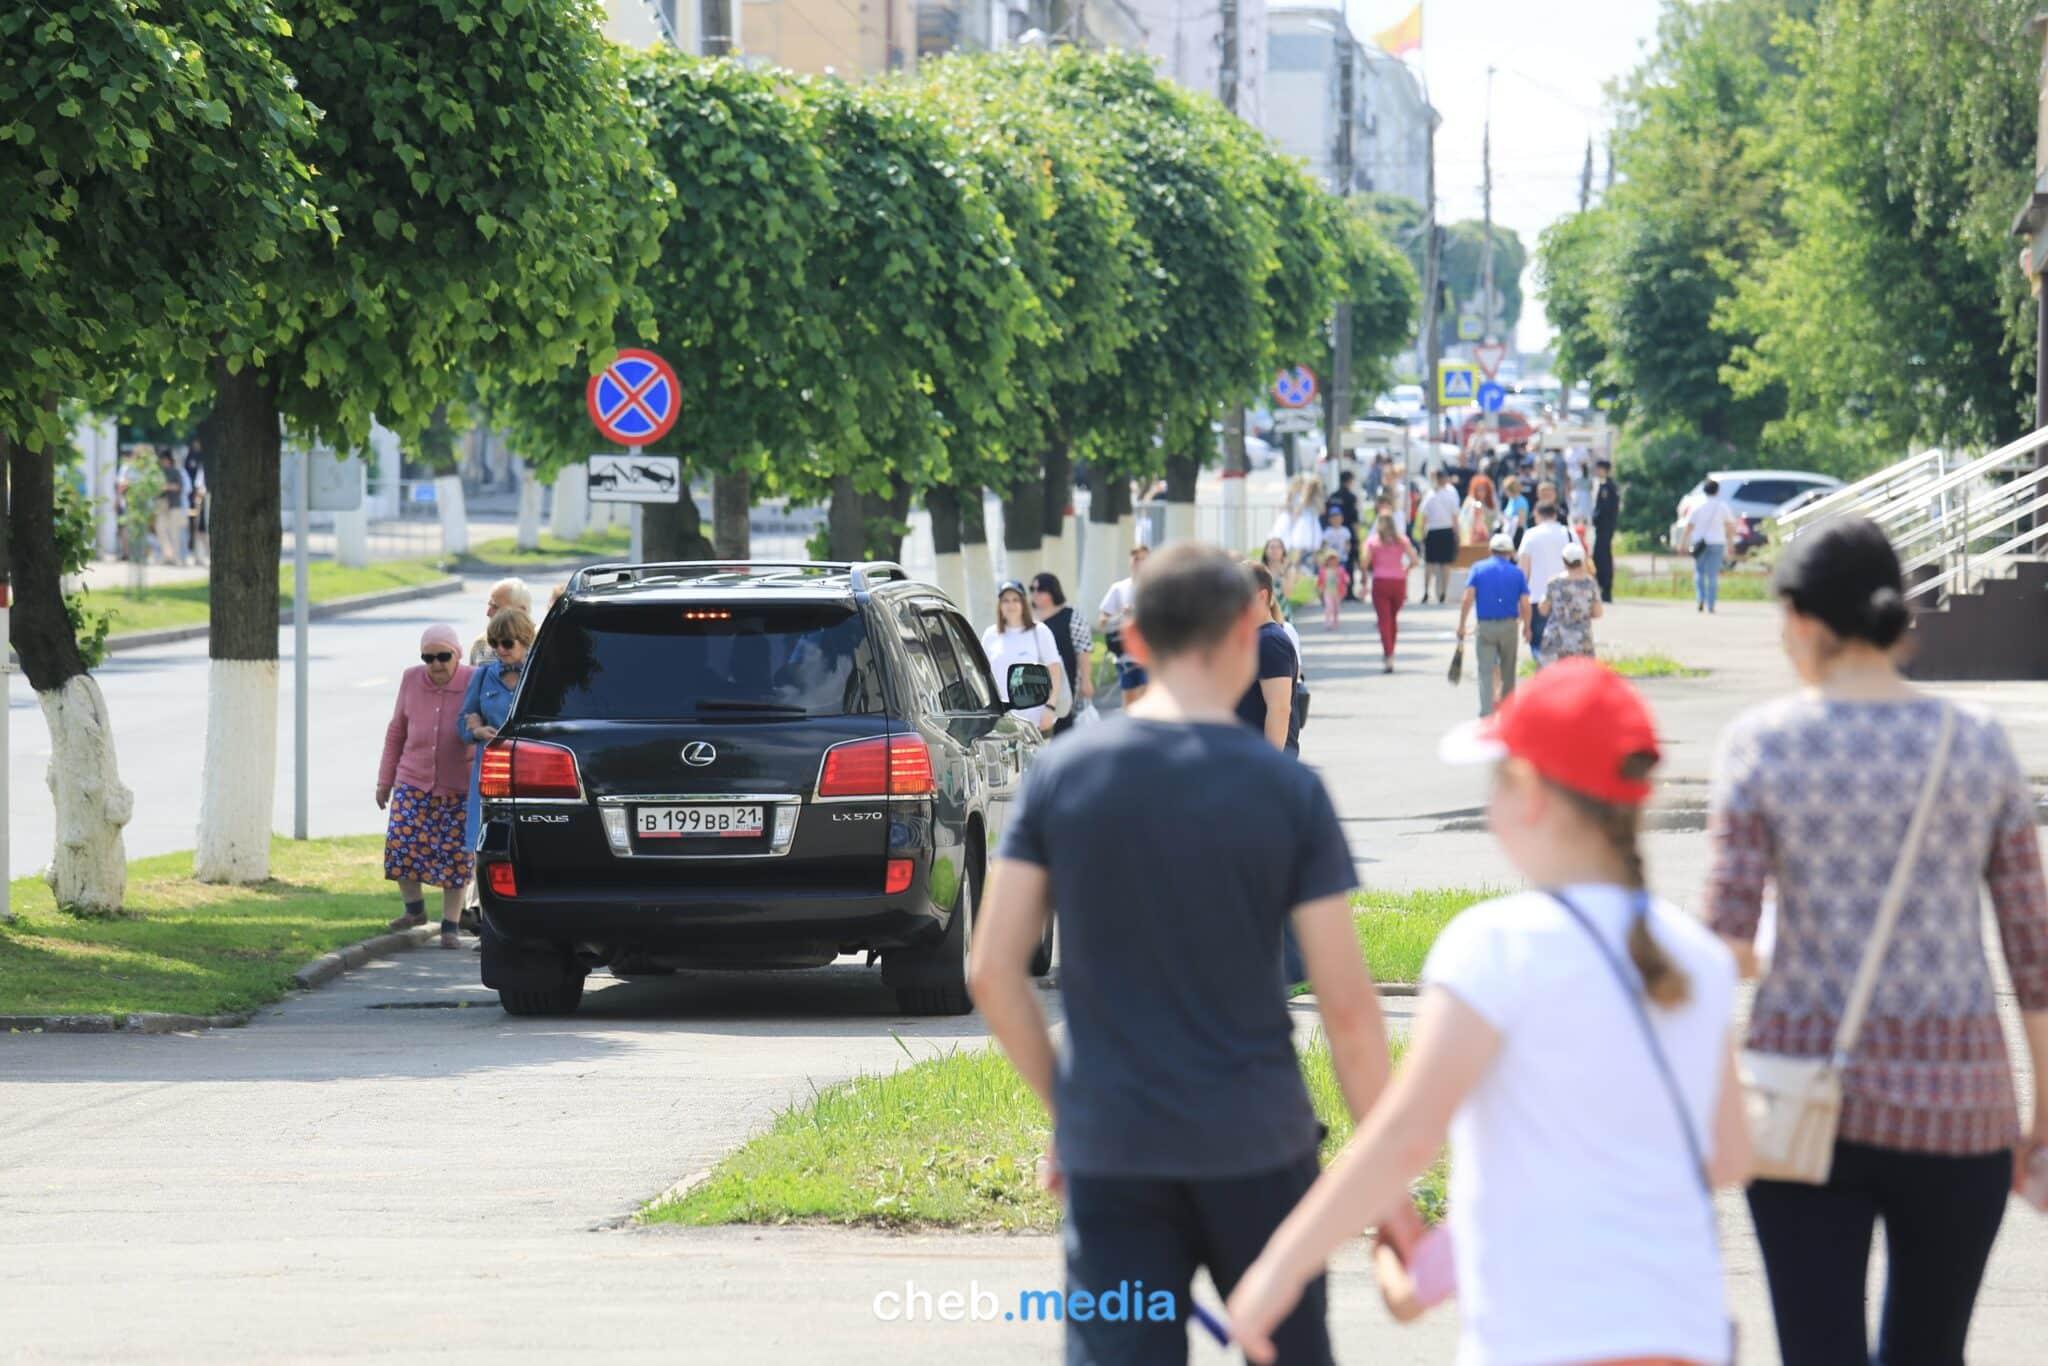 Леонид Якубович на Лексусе едет по тротуару в Чебоксарах